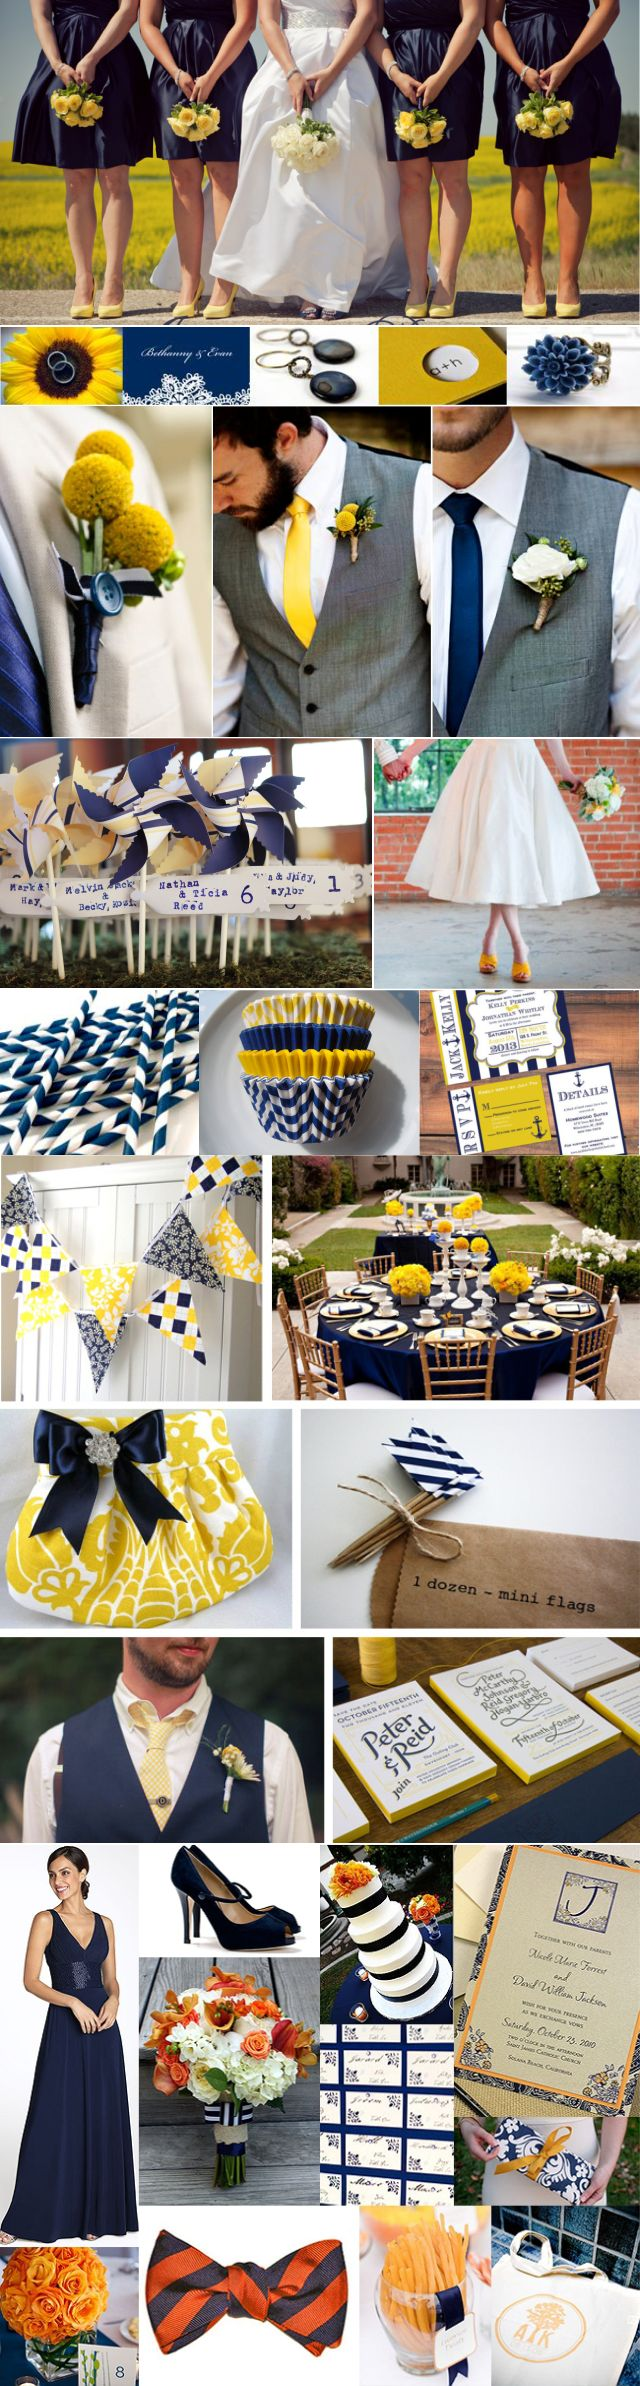 Navy and Yellow wedding inspiration